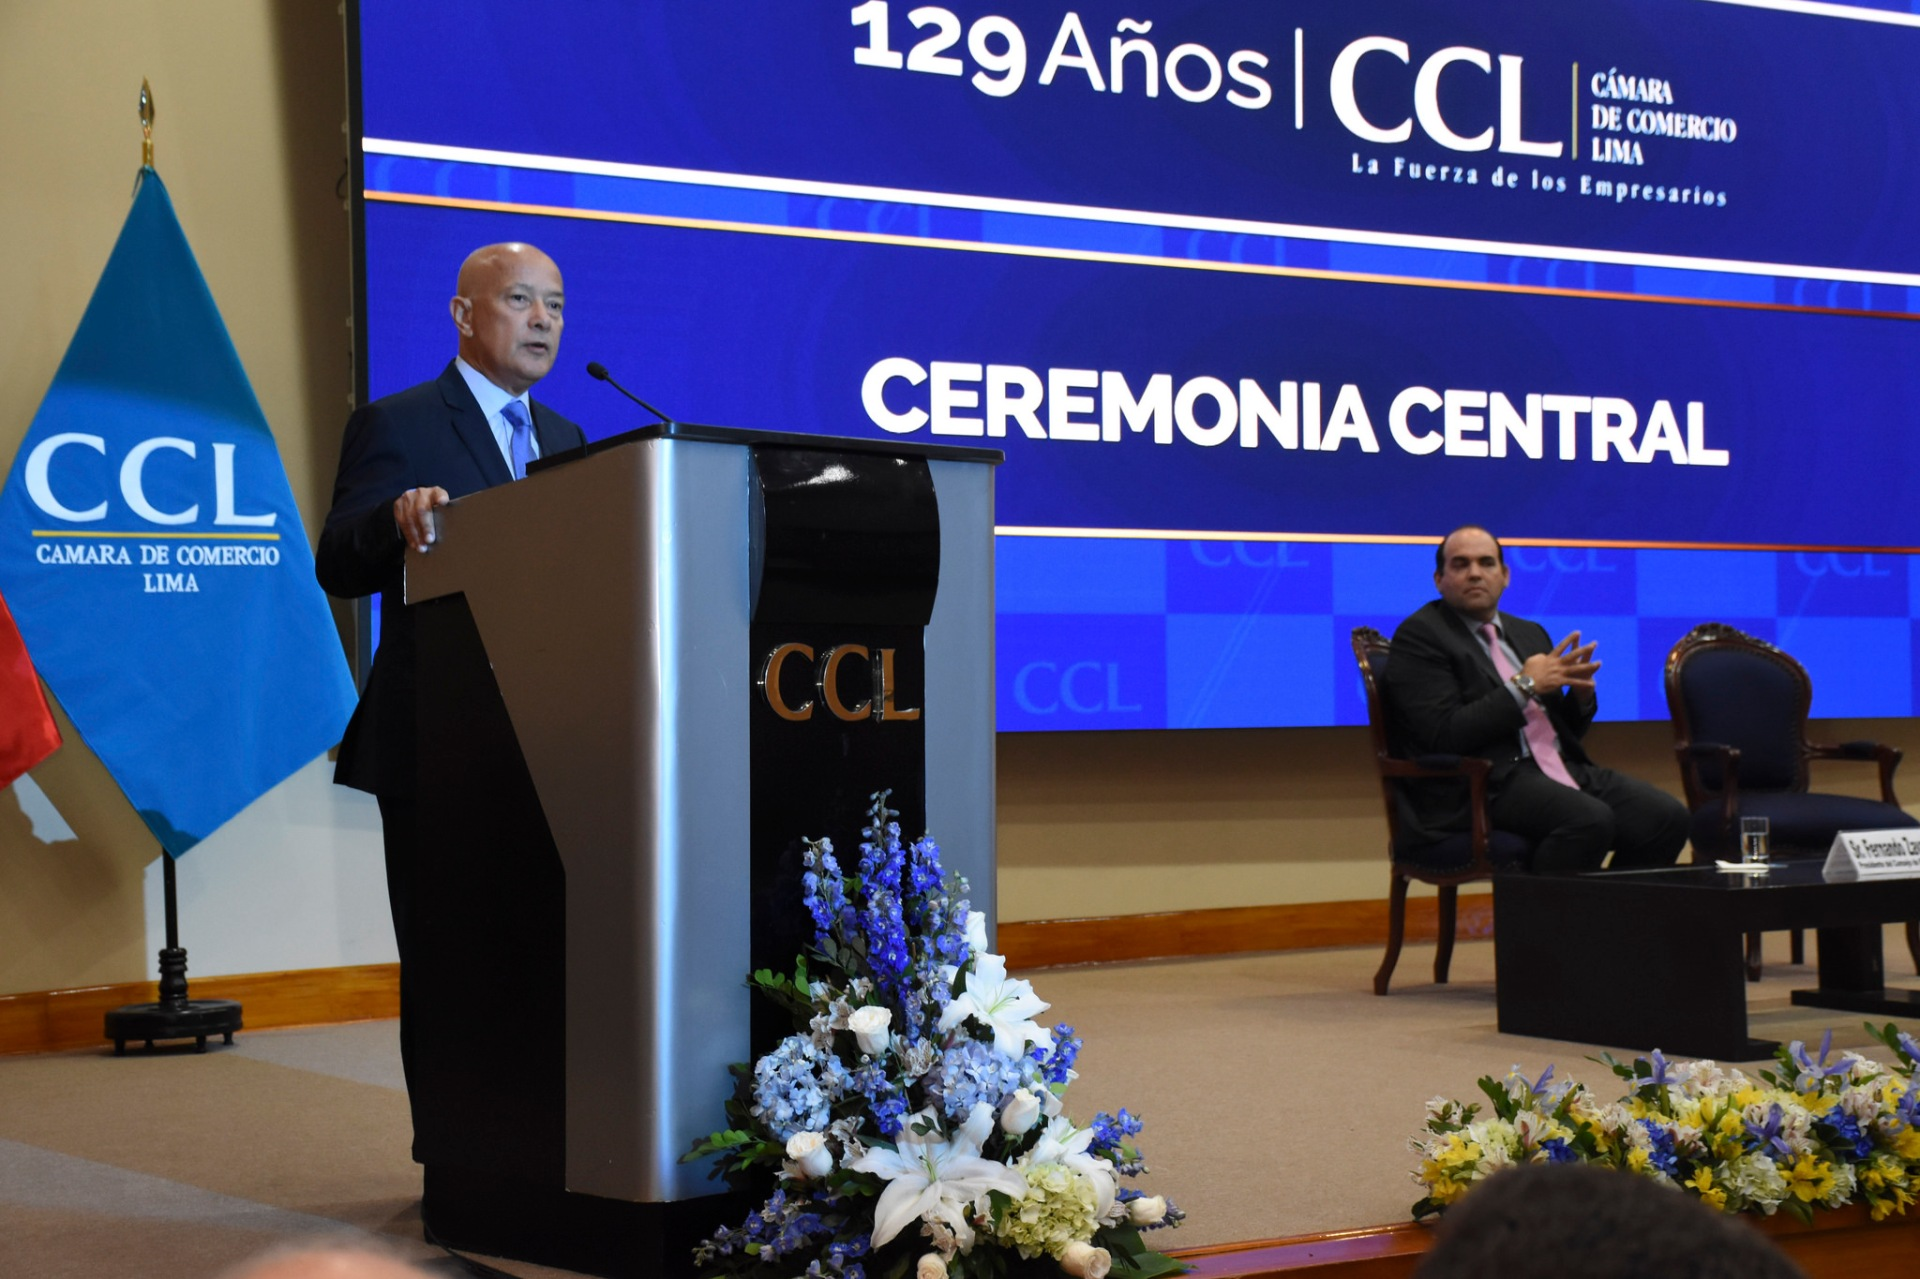 Mongilardi en la ceremonia central de la CCL